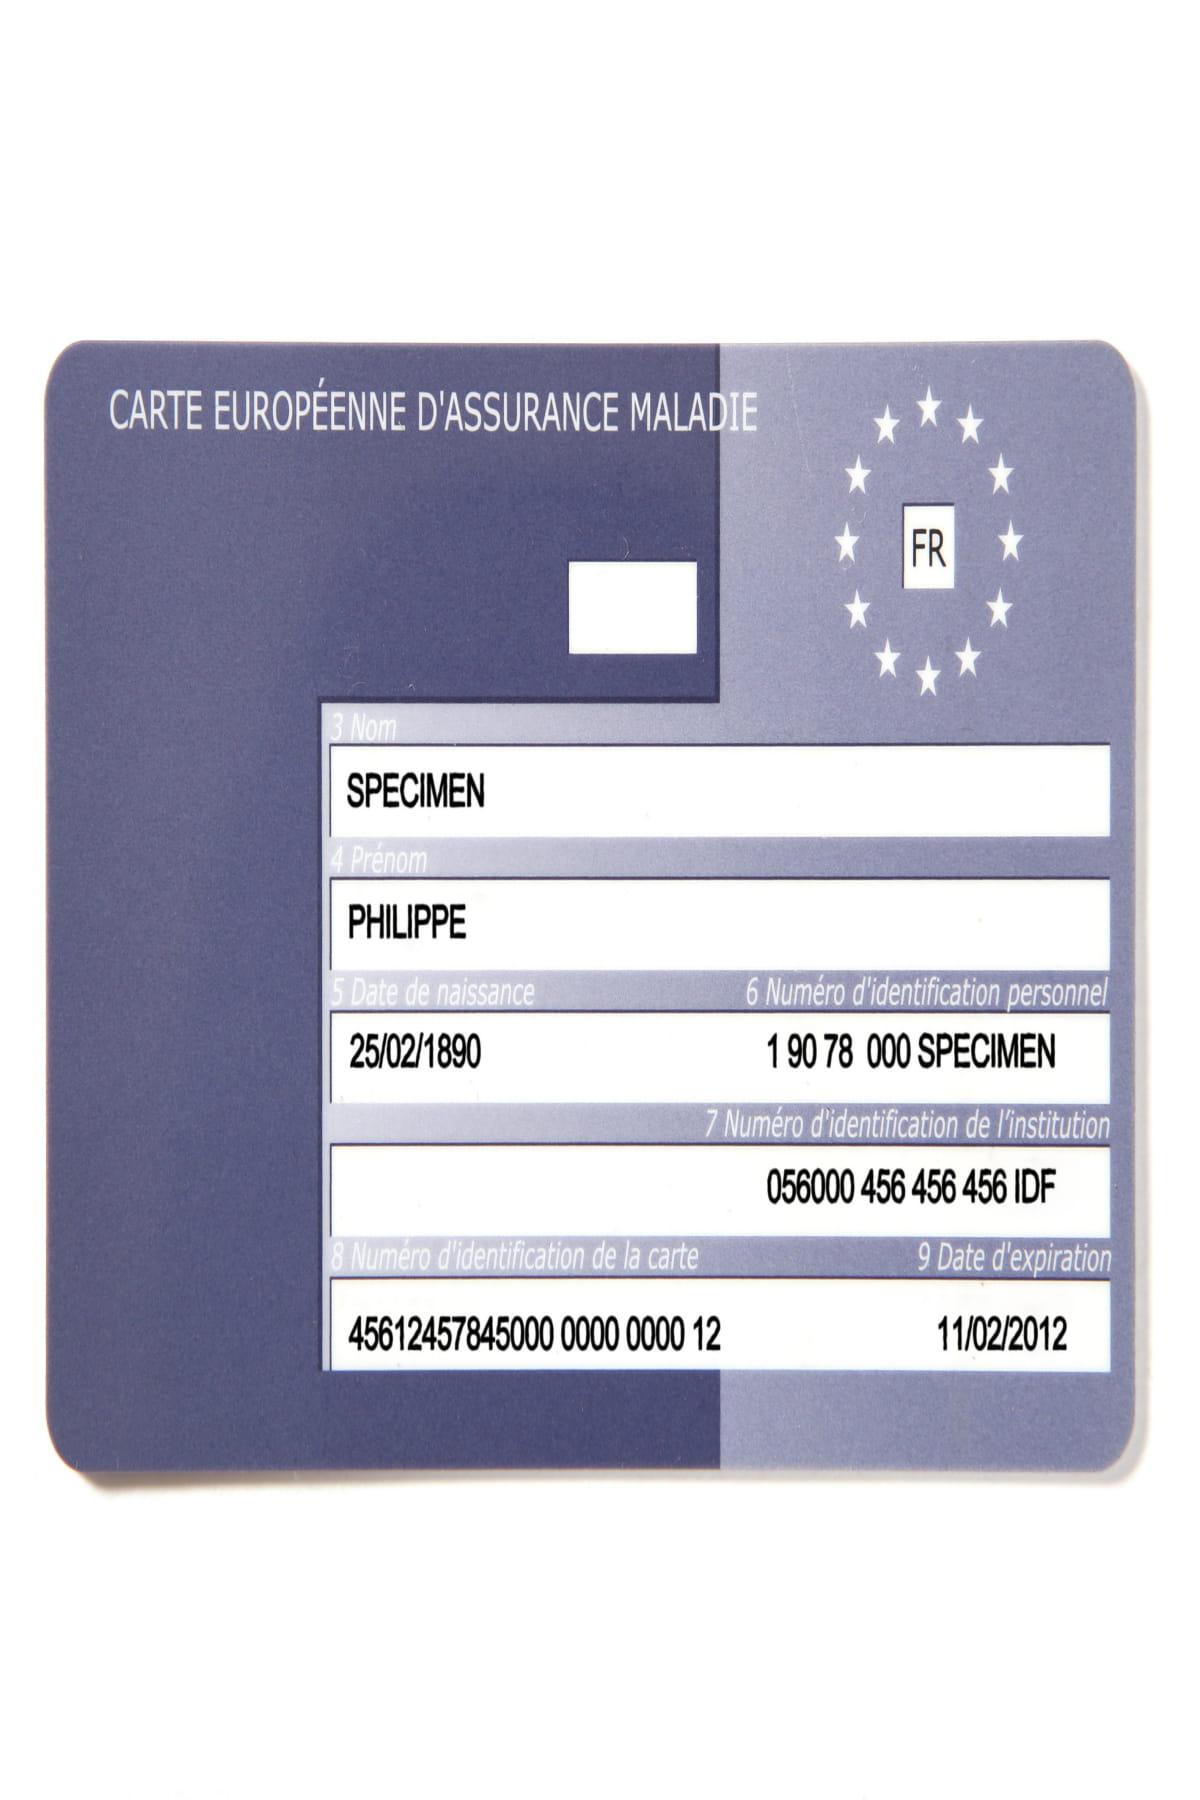 Demander Sa Carte Europeenne D Assurance Maladie